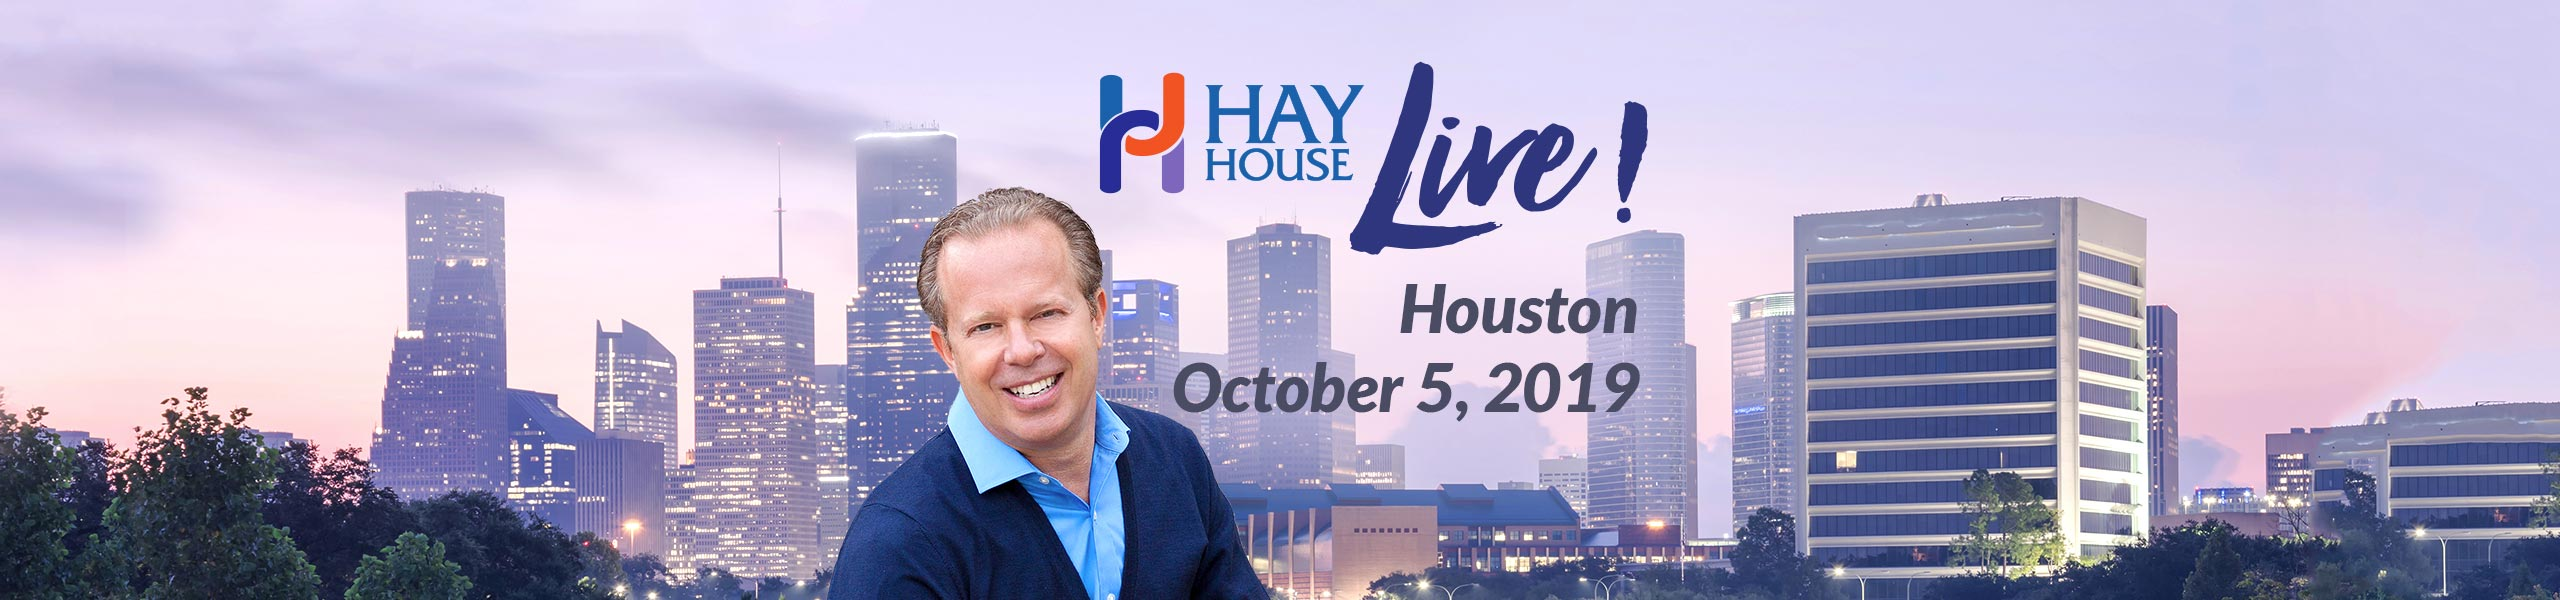 Hay House Live! Houston 2019 - Joe Dispenza